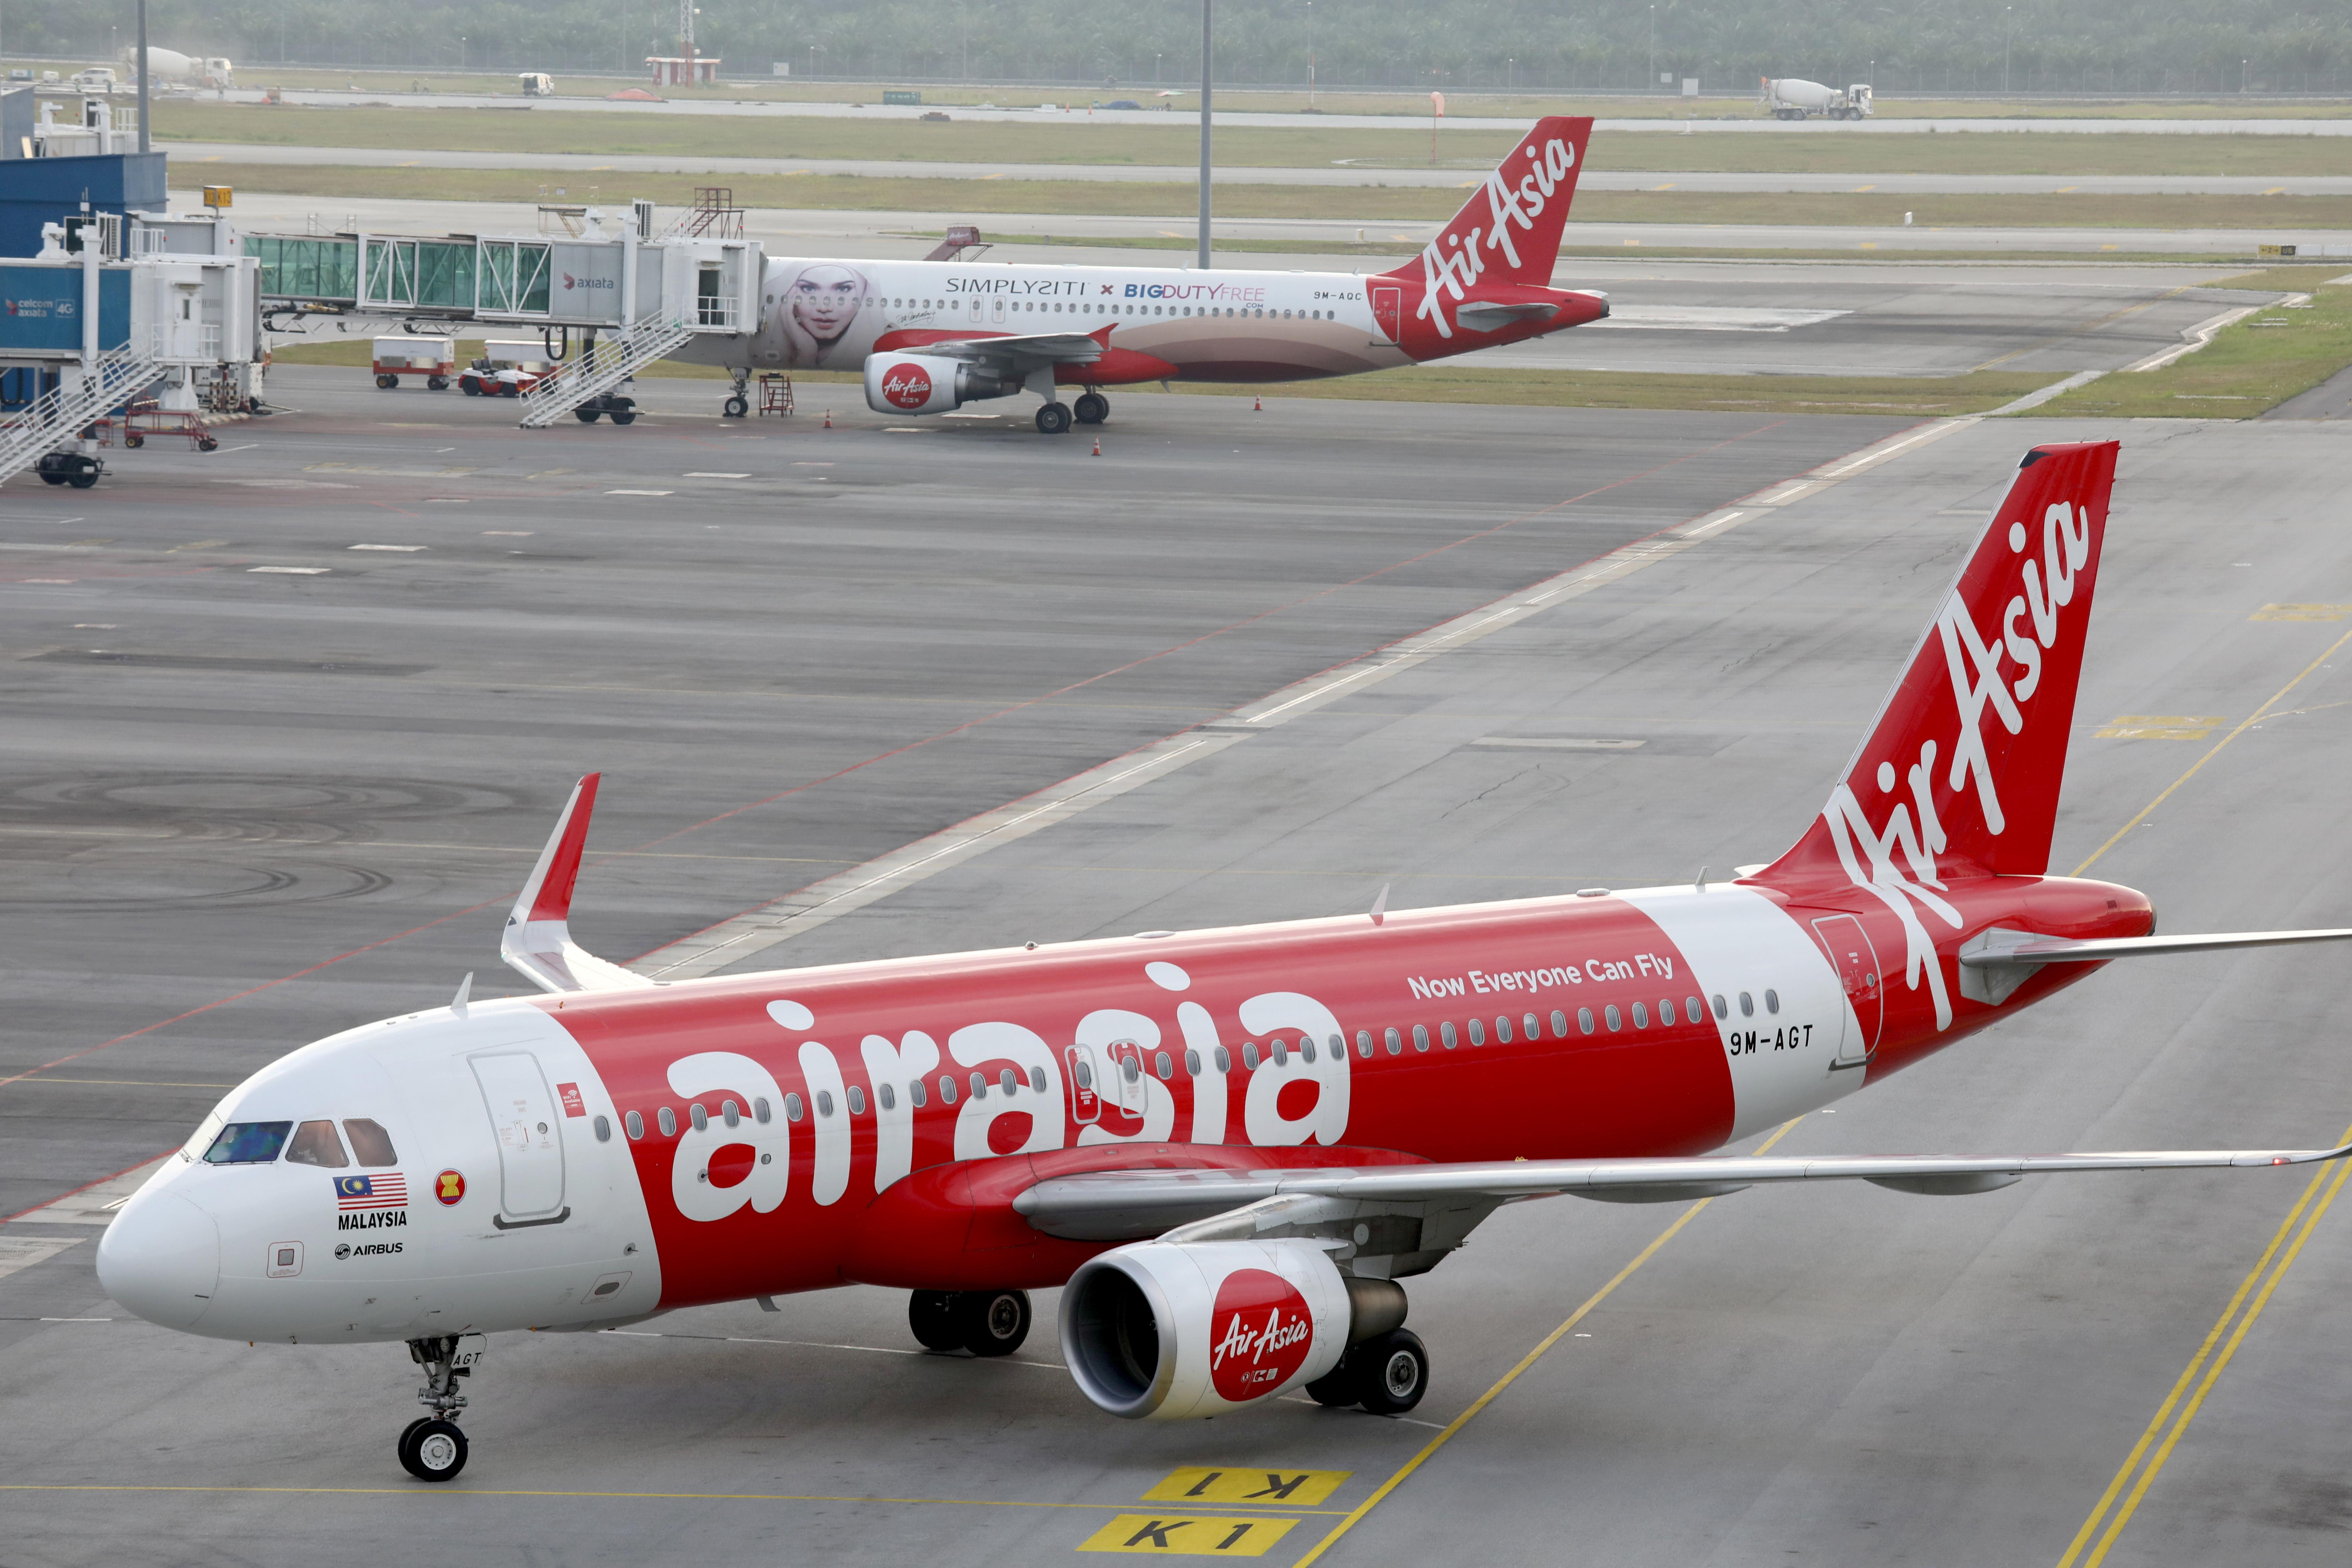 AirAsia Airbus A320-200 planes are seen on the tarmac of Kuala Lumpur International Airport 2 (KLIA2) in Sepang, Malaysia, February 4, 2020. REUTERS/Lim Huey Teng